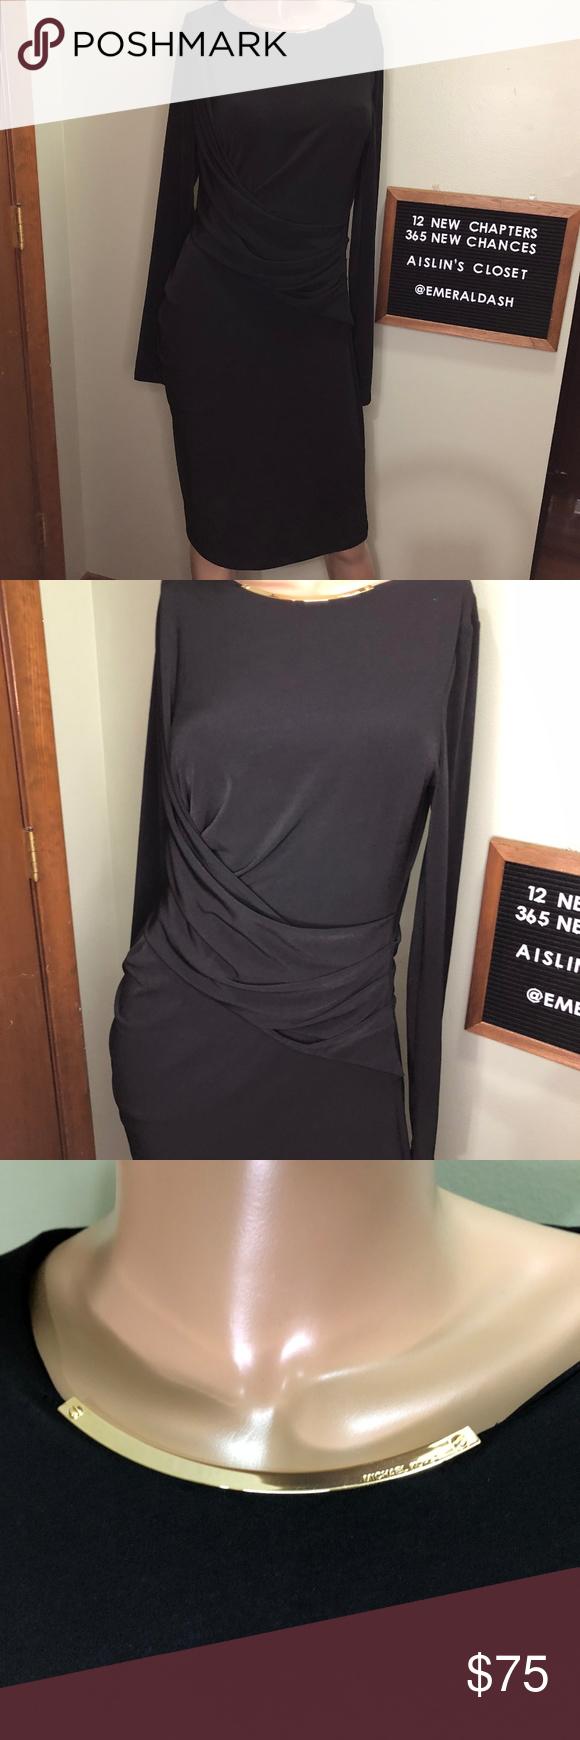 Michael Kors Black Midi Dress With Gold Accent Black Midi Dress Michael Kors Black Michael Kors Dresses [ 1740 x 580 Pixel ]